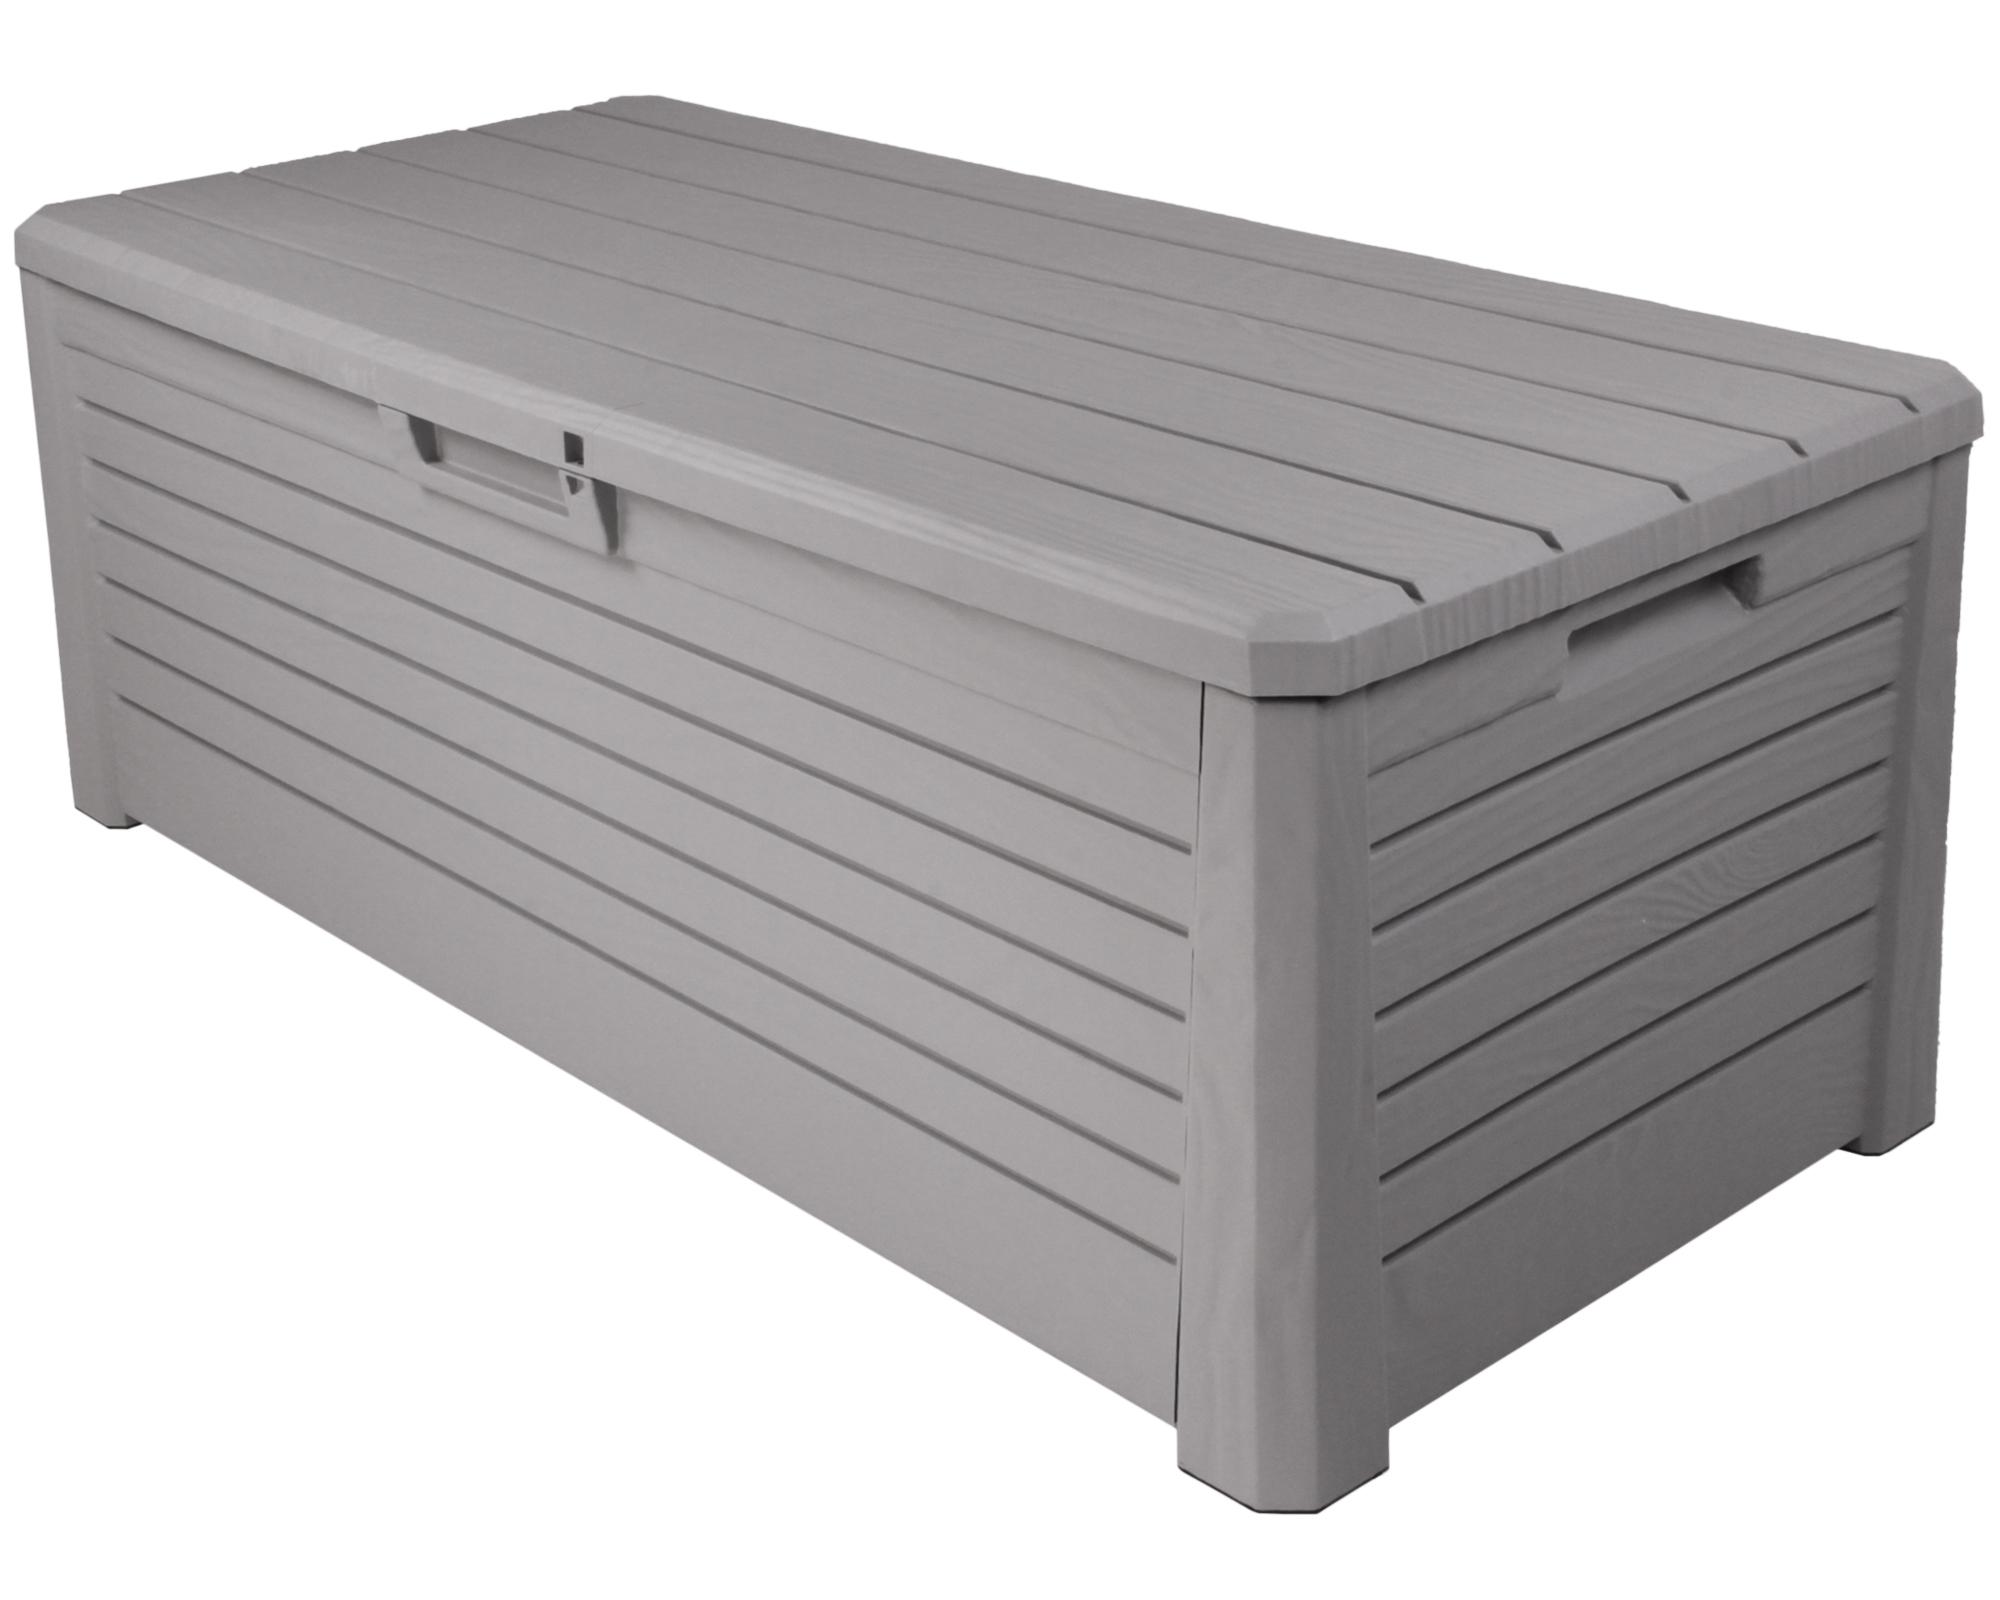 ondis24 kissenbox sitztruhe florida 550 l grau g nstig online kaufen. Black Bedroom Furniture Sets. Home Design Ideas